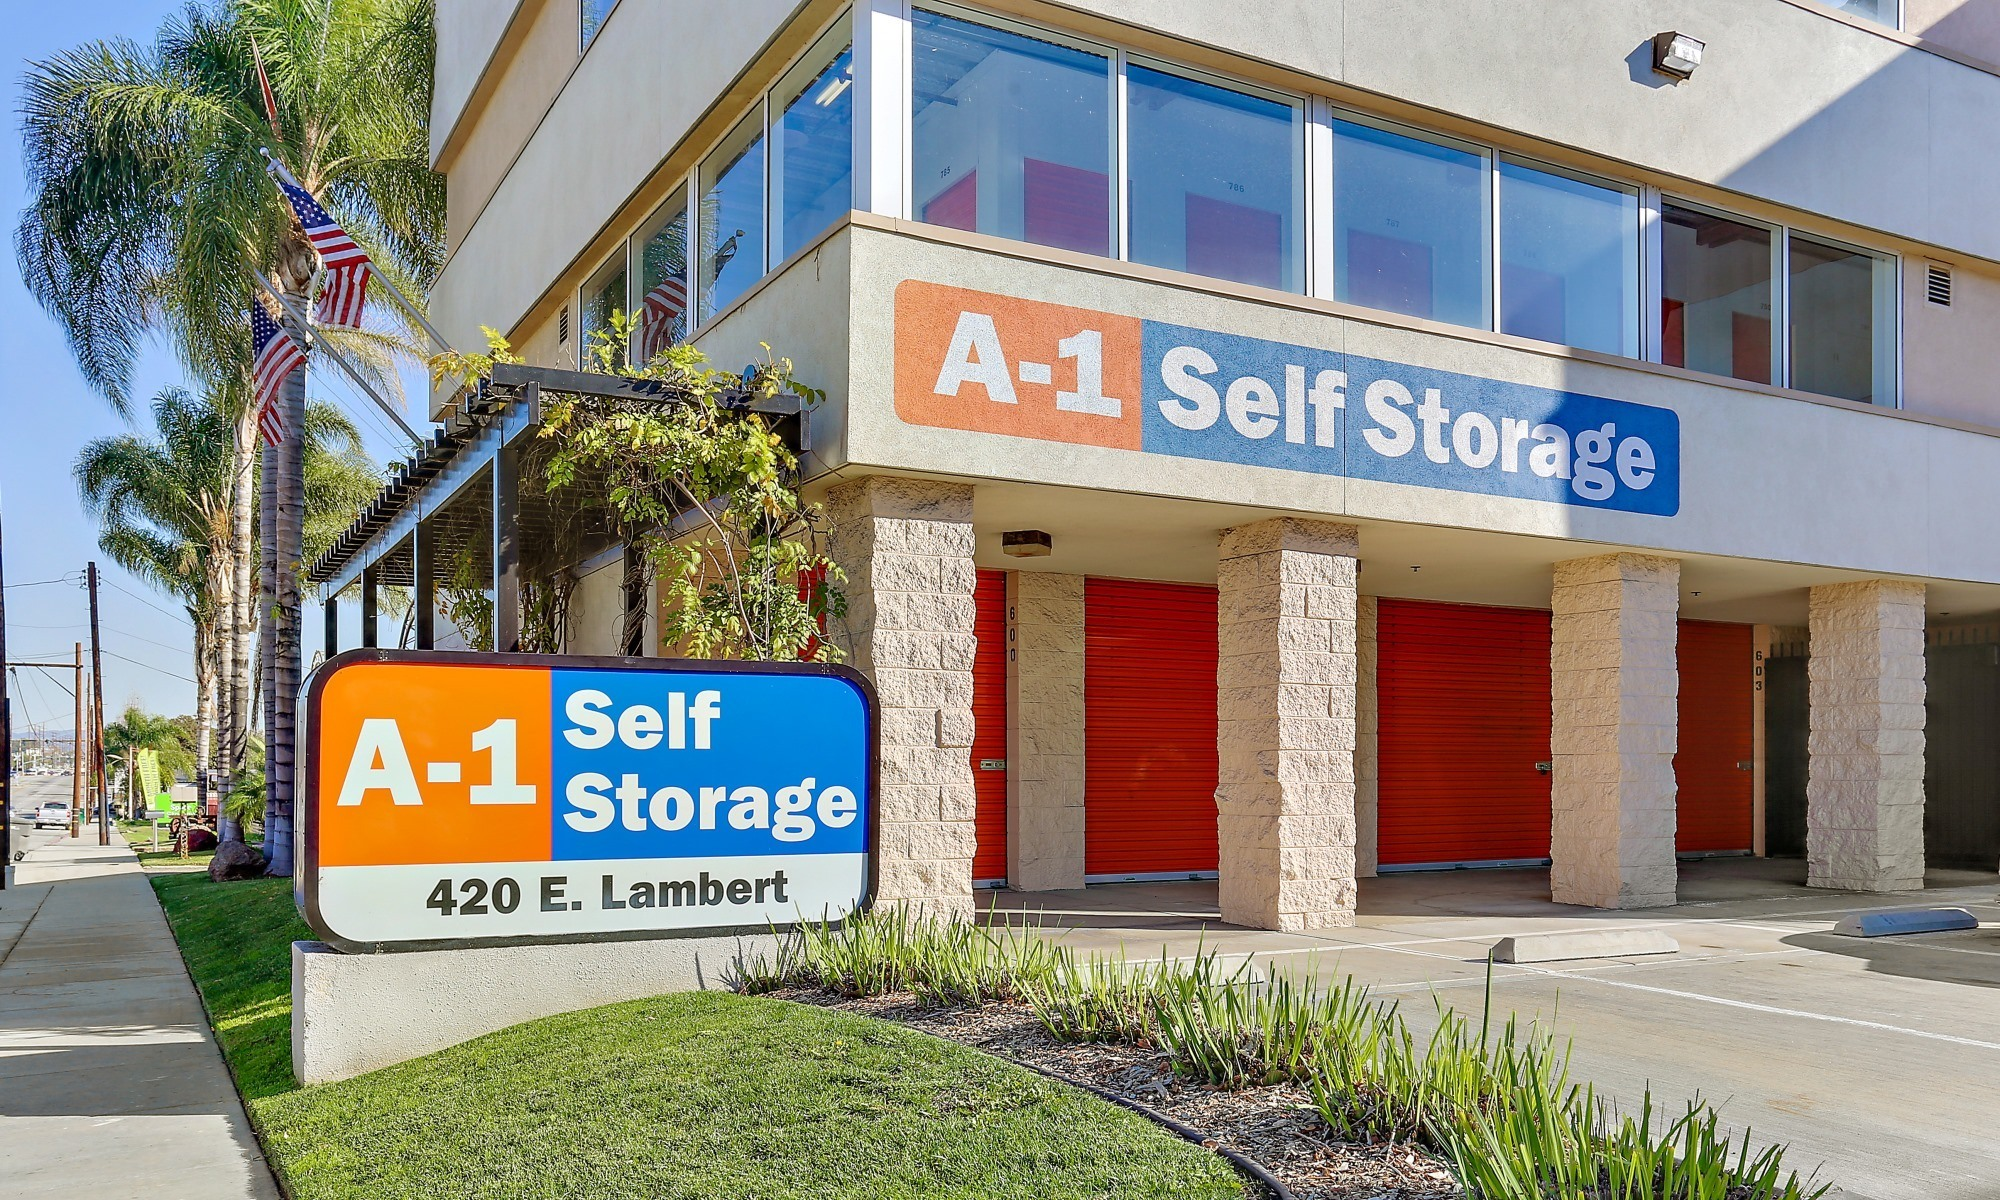 Self storage in La Habra CA